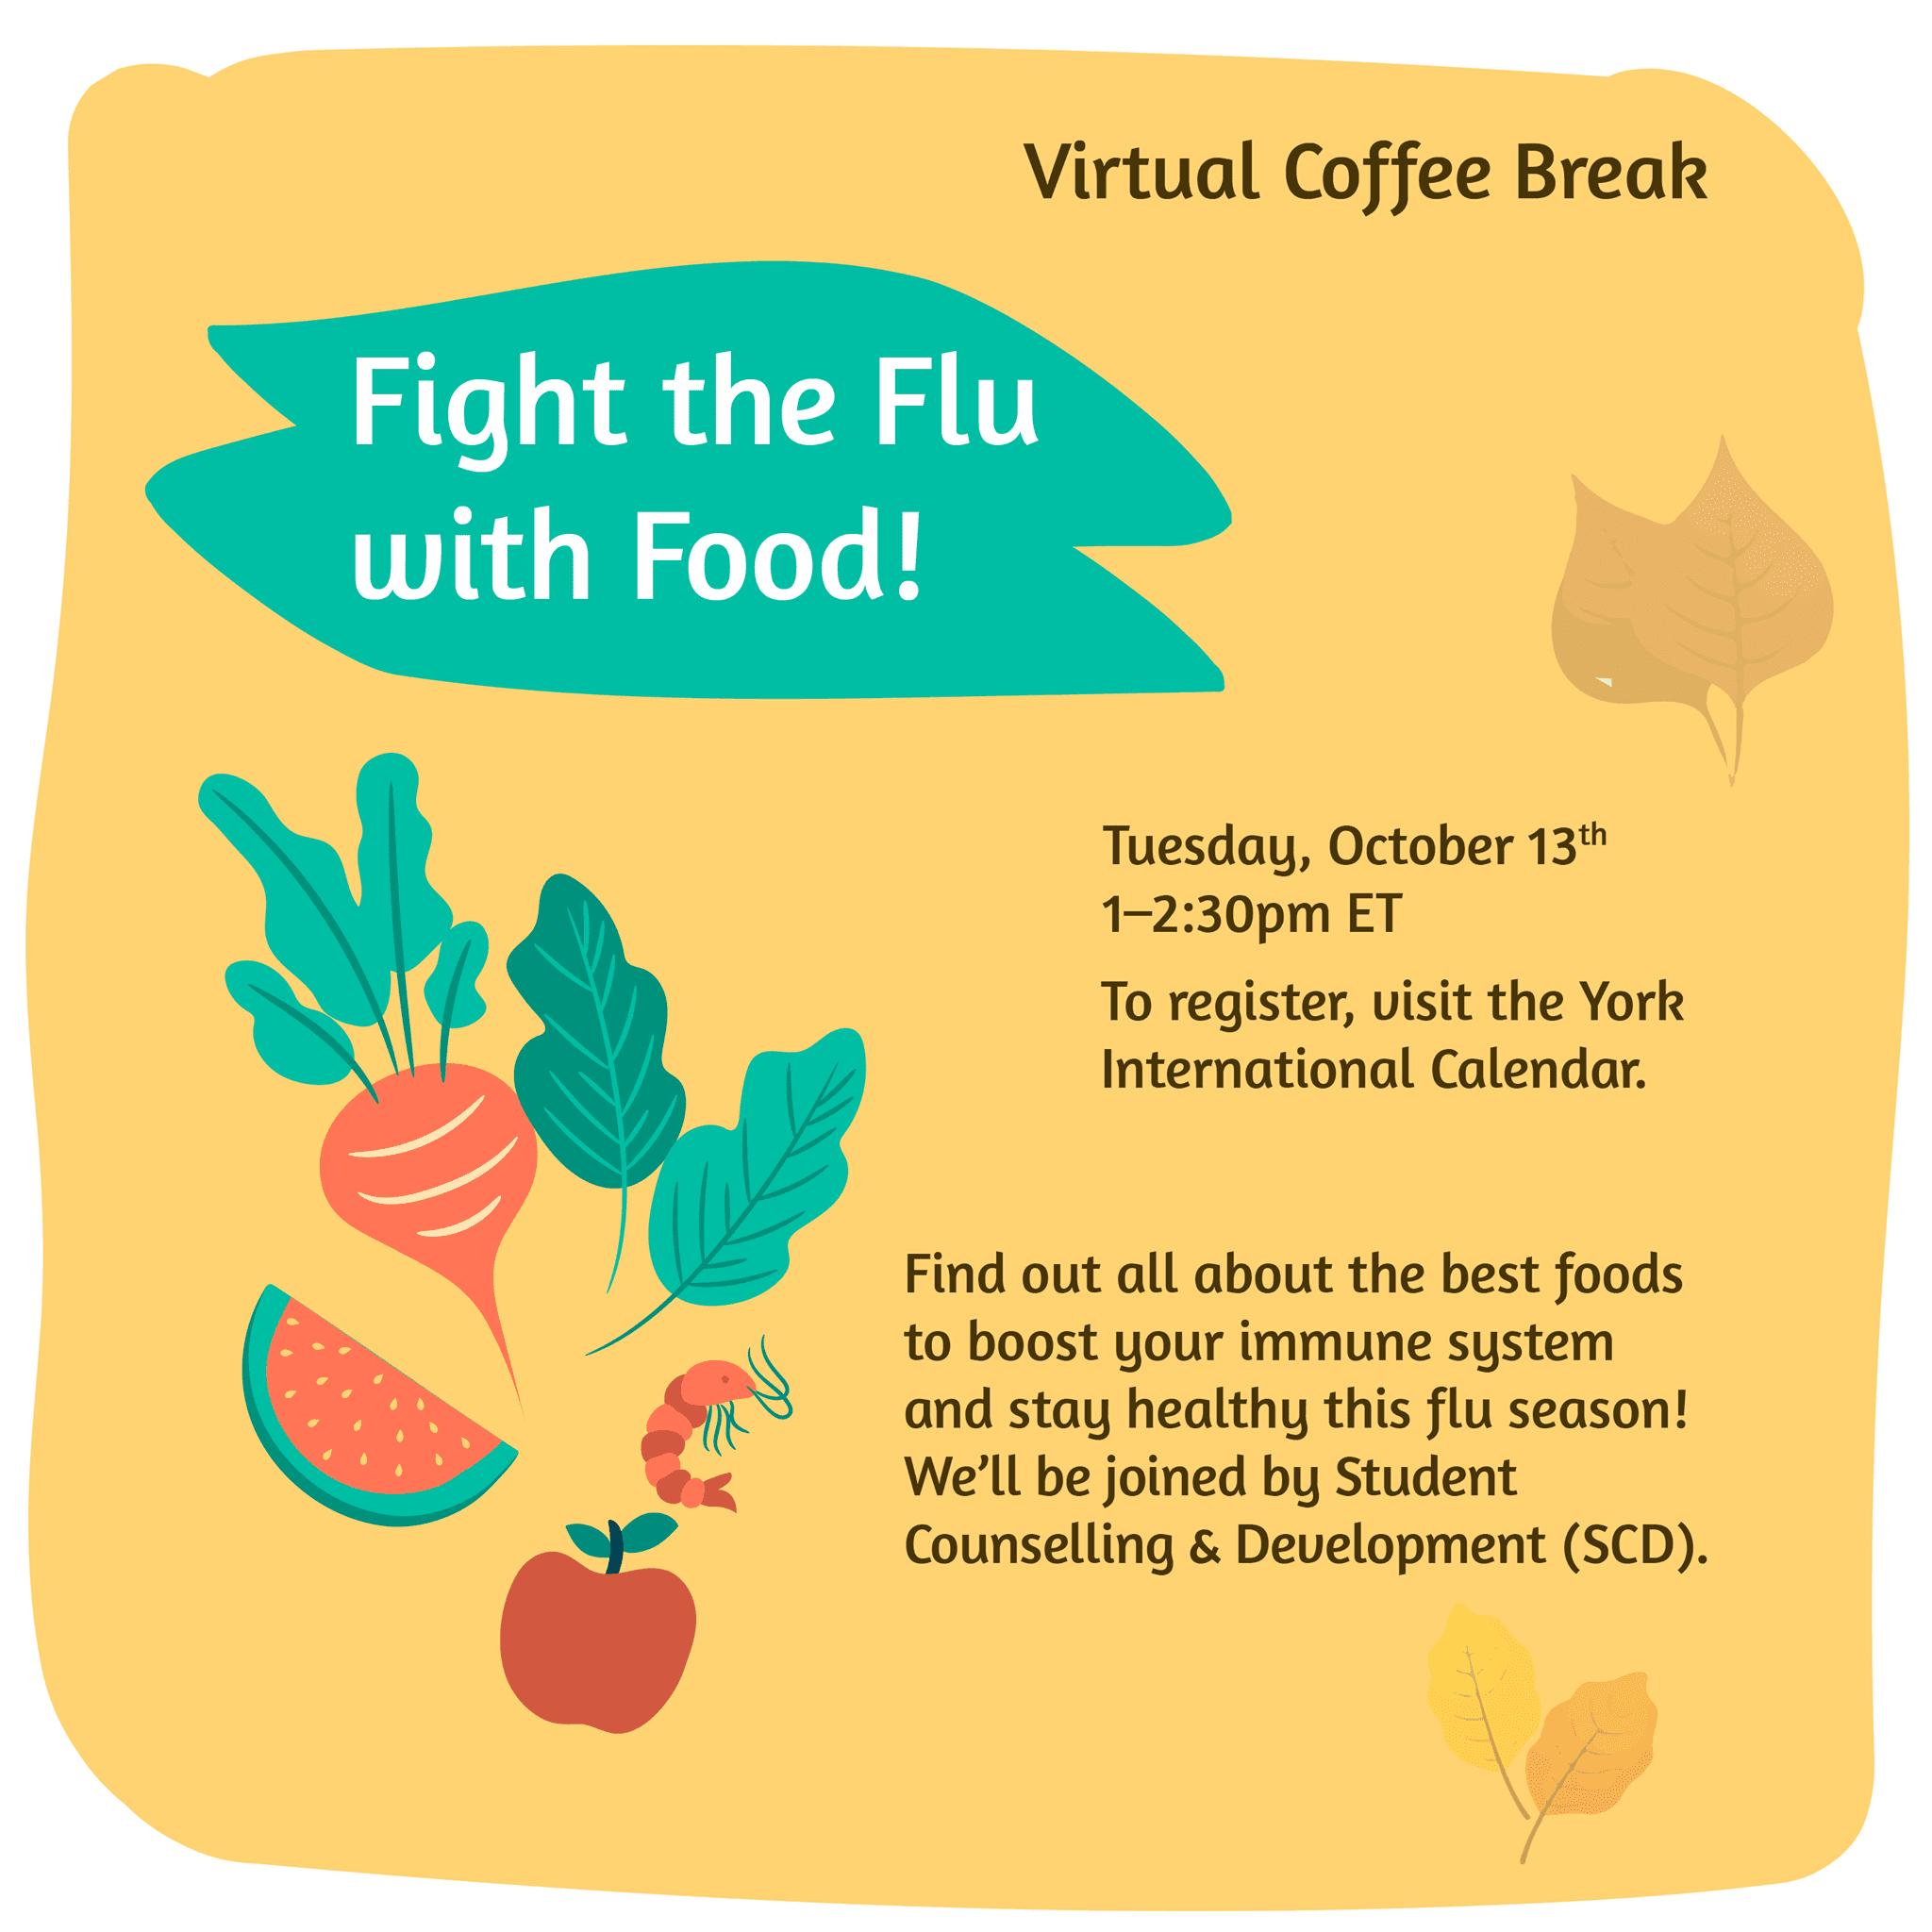 Virtual Coffee Break - Fight the Flu with Food @ Zoom